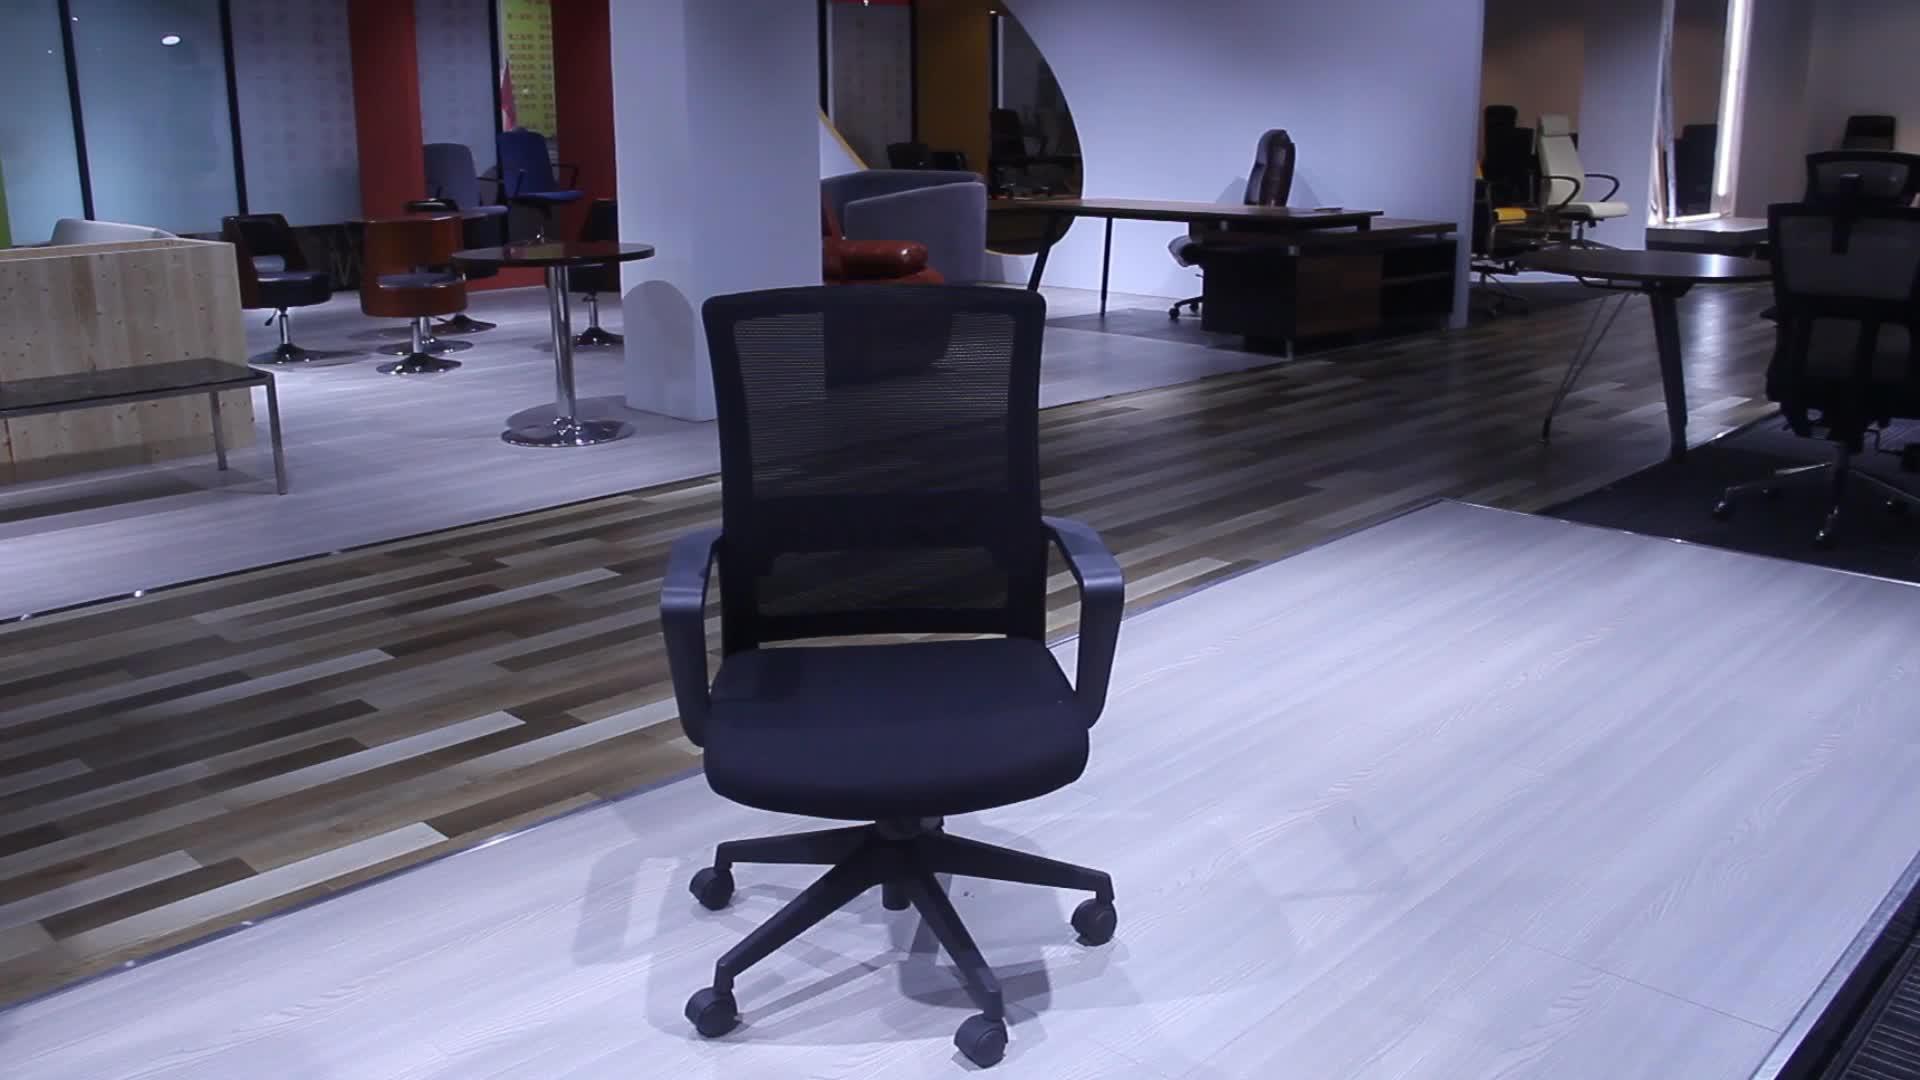 Hohe Qualität Mesh Stuhl Sitzungssaal Mesh Stuhl Günstige Einfache swivel Mesh Stuhl